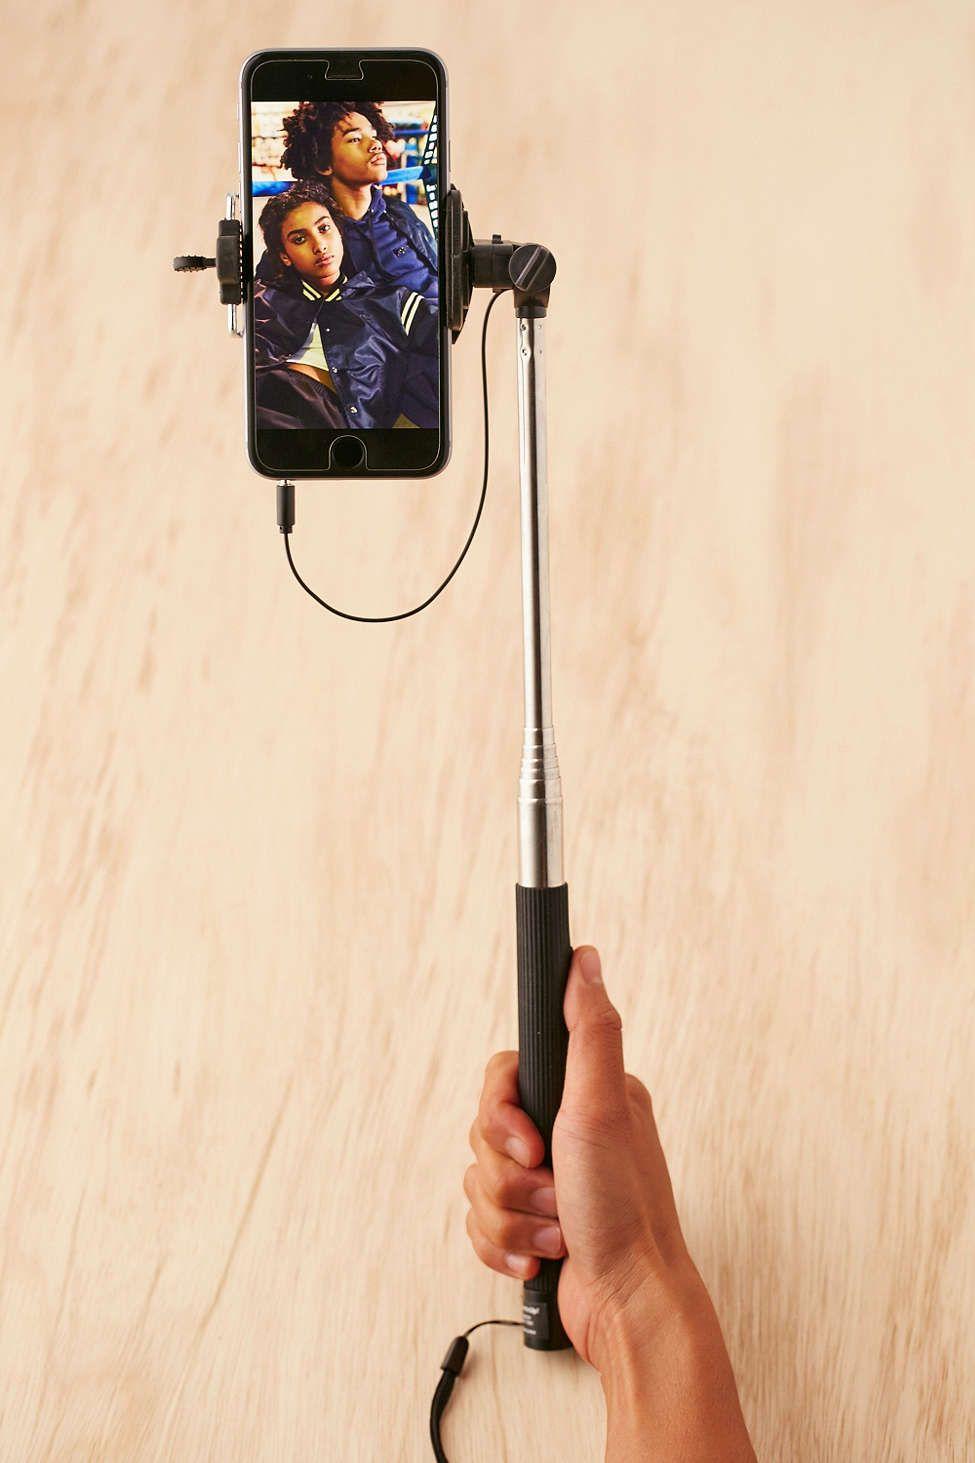 Selfie Click Stick Tech gifts, Selfie stick, Nail salon